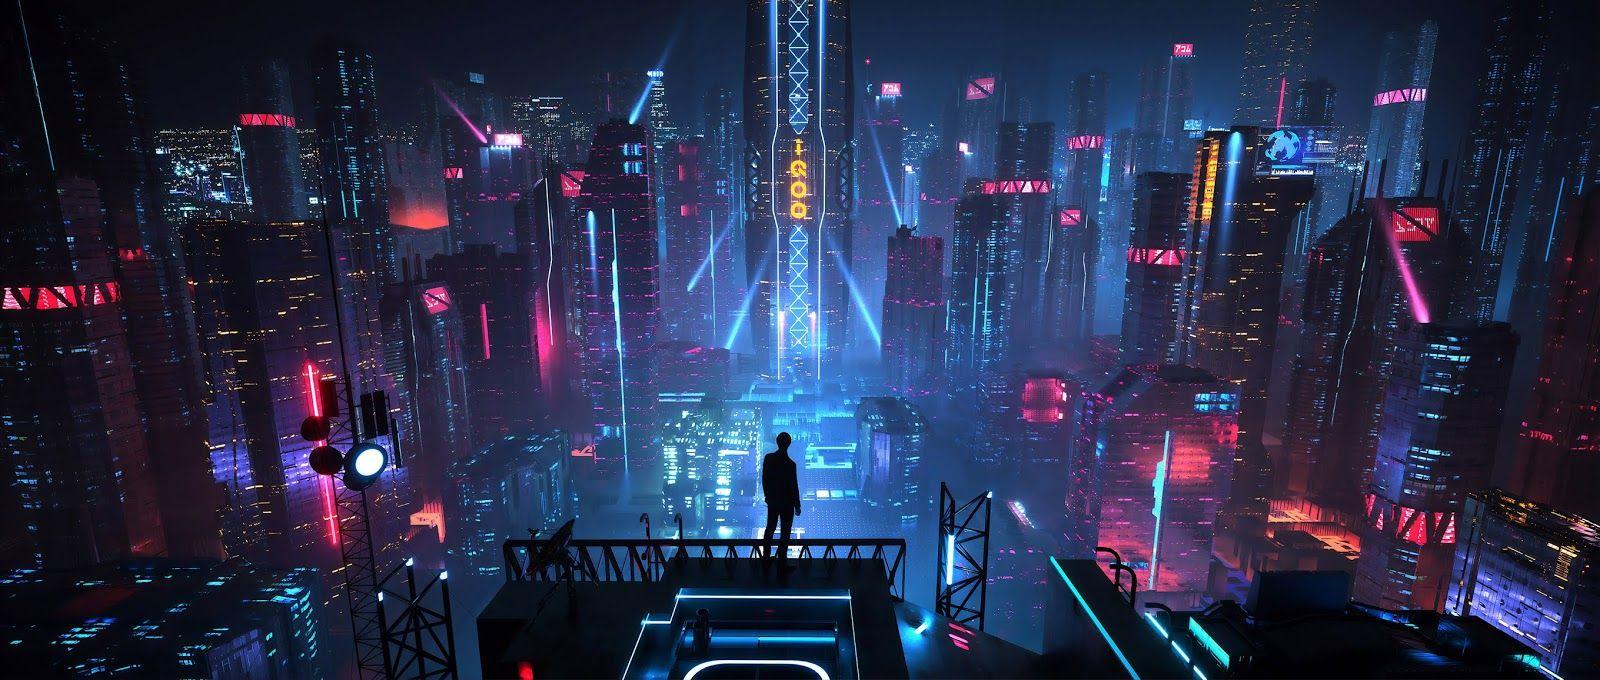 Futuristic City Wallpaper Desktop Background Cyberpunk City City Wallpaper Futuristic City